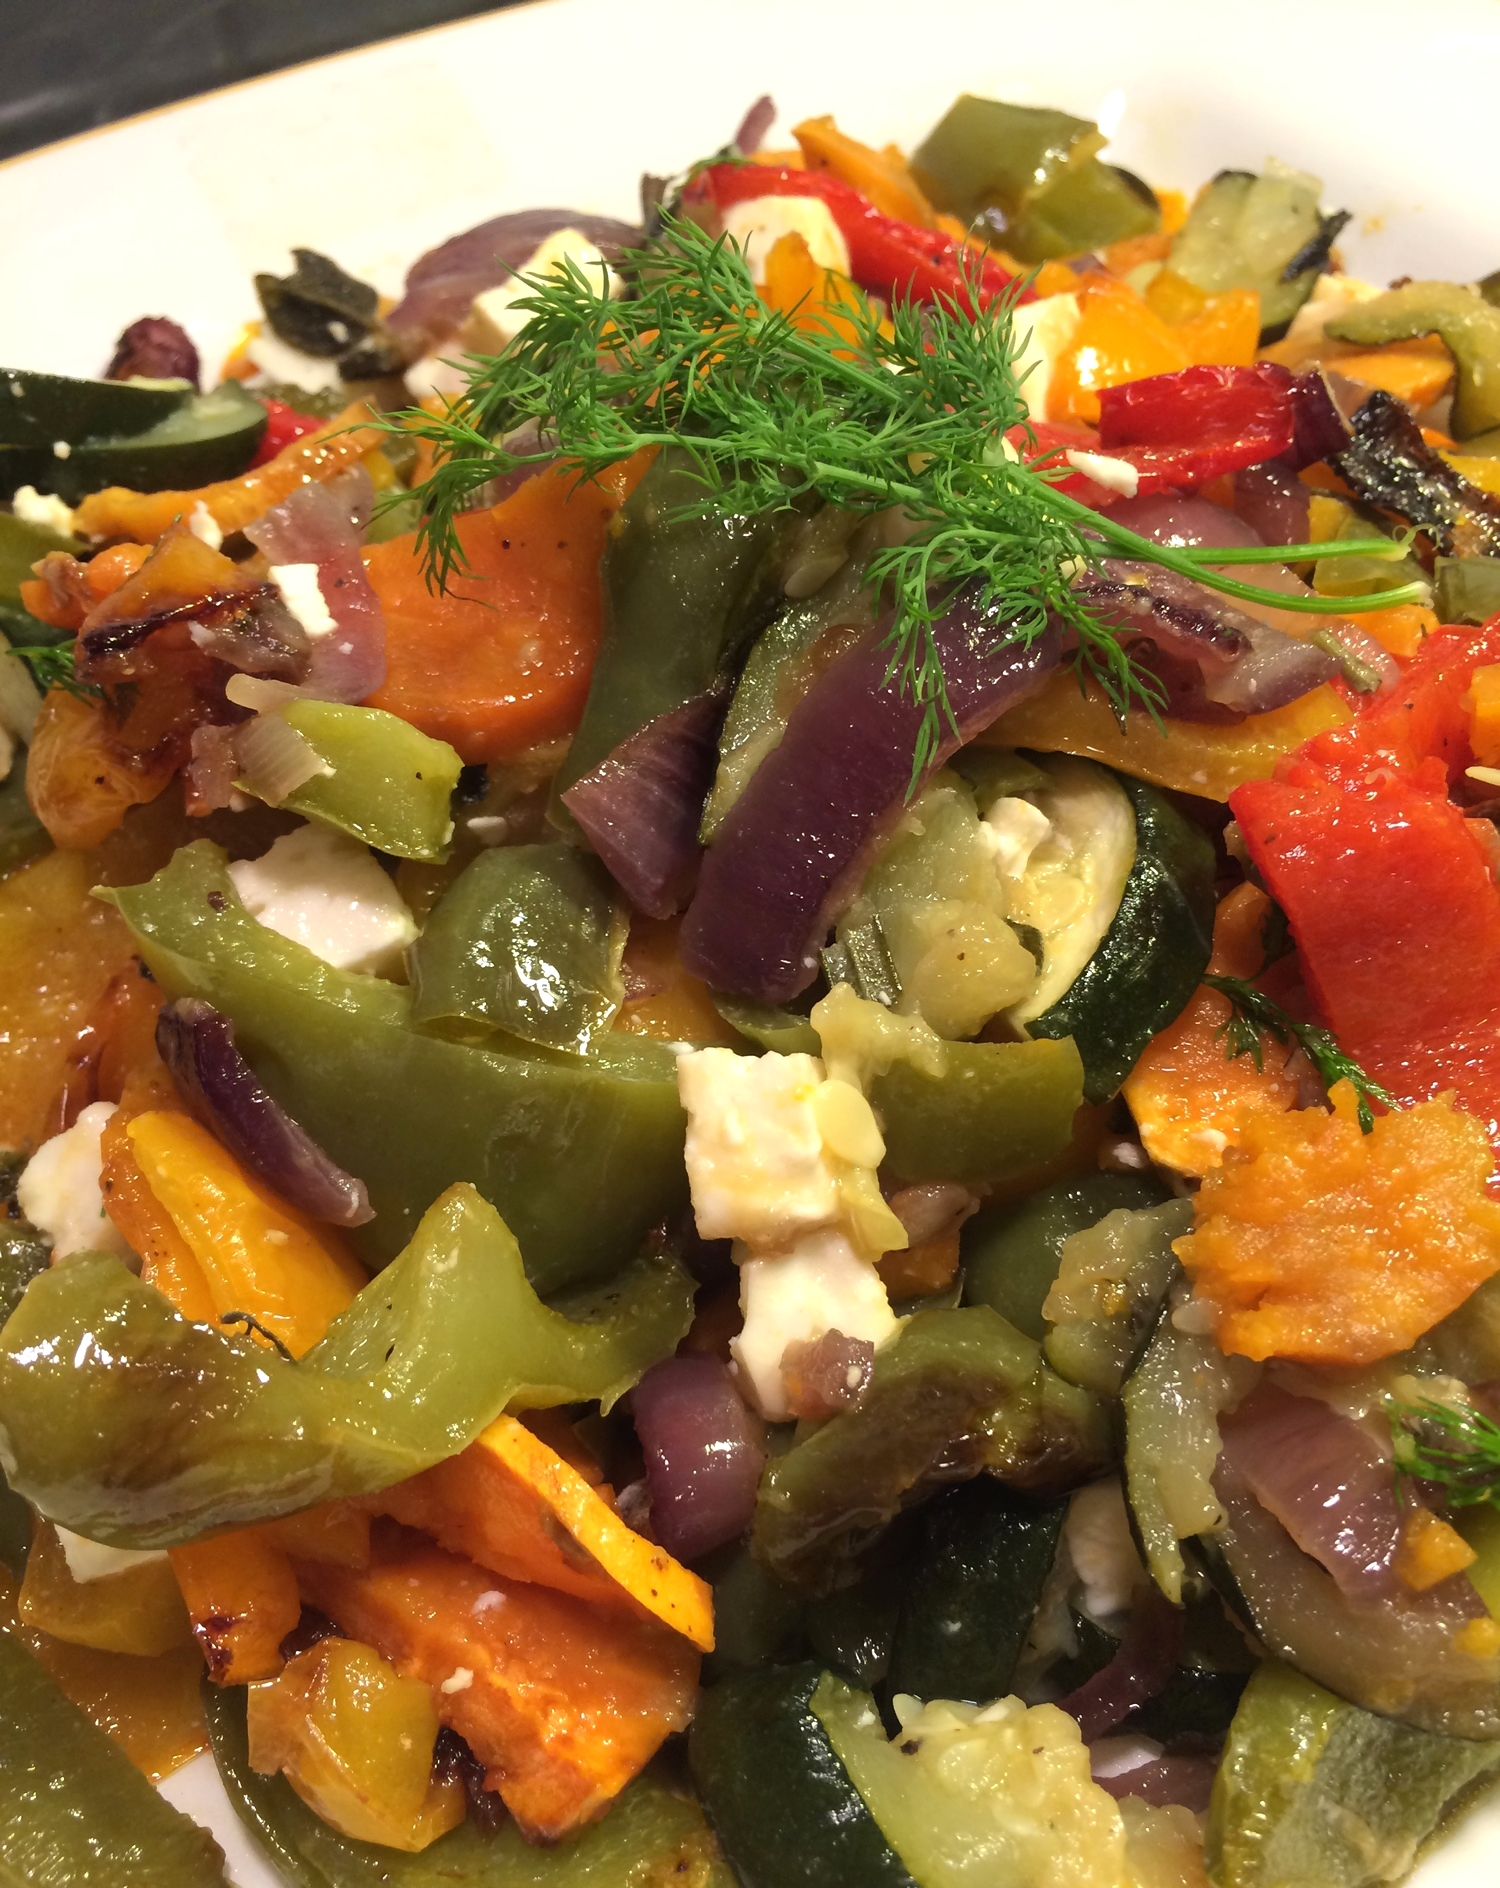 roasted veg with feta 2.JPG